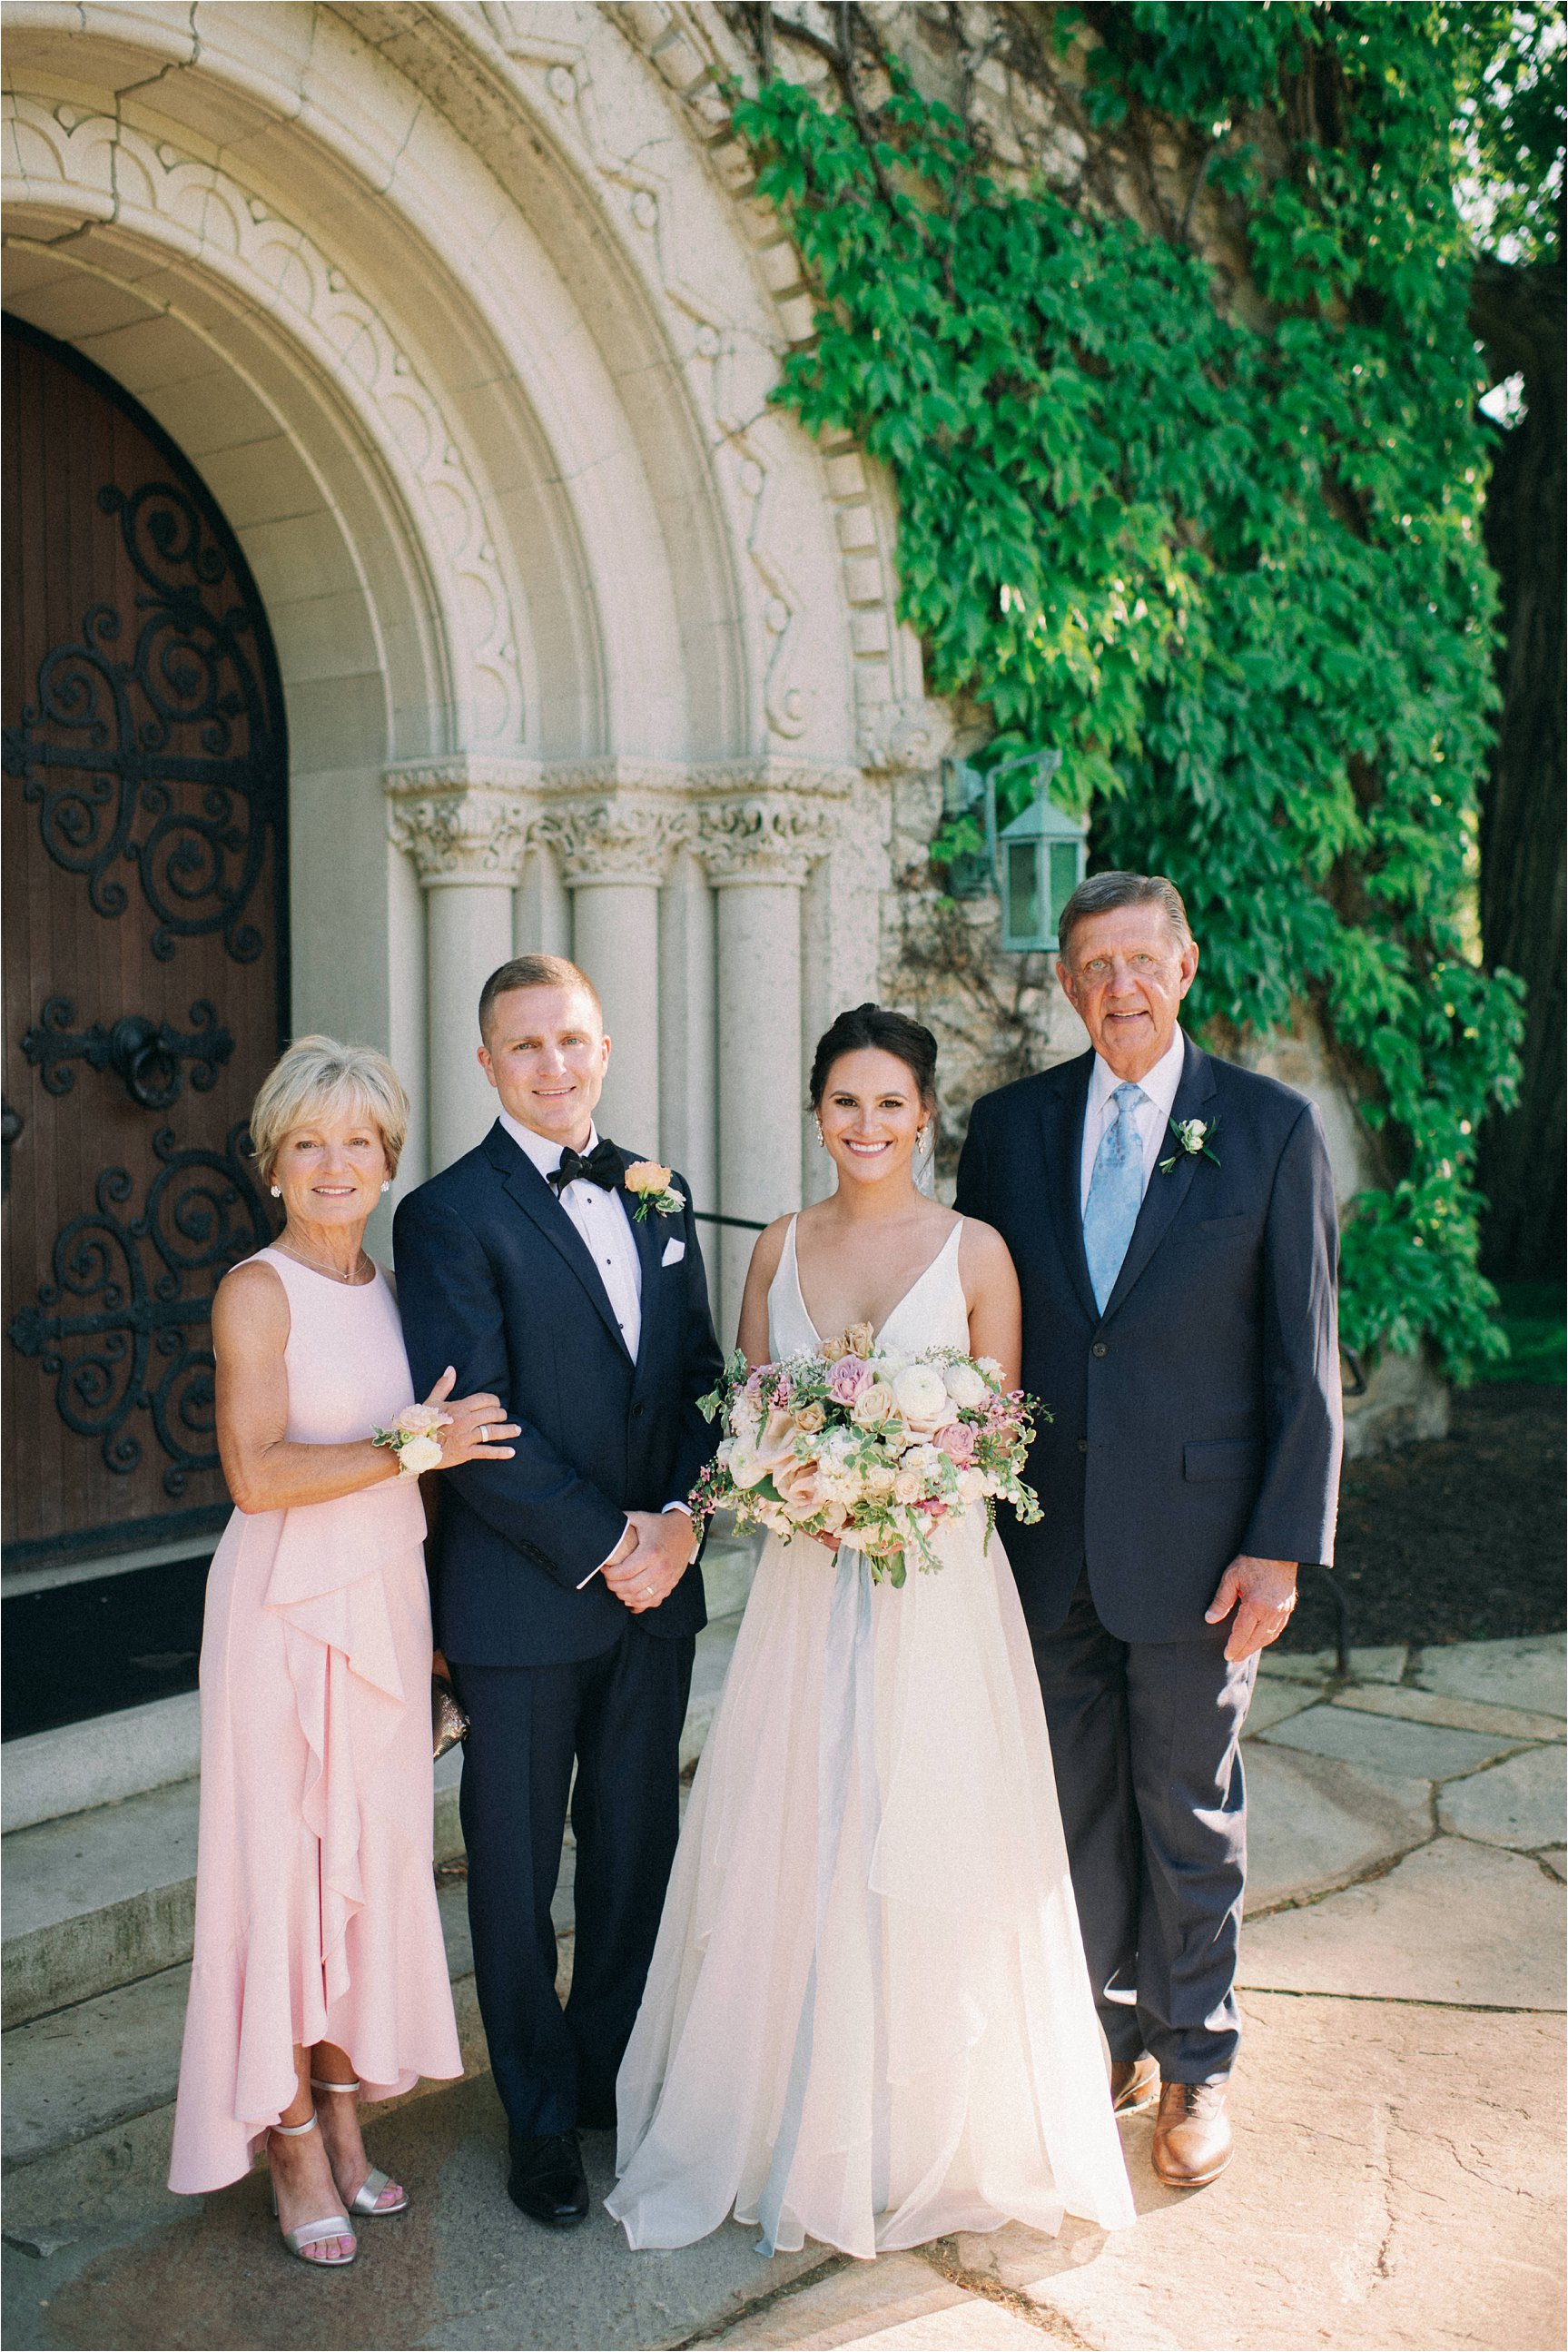 Lord_Thompson_Manor_Wedding086.JPG